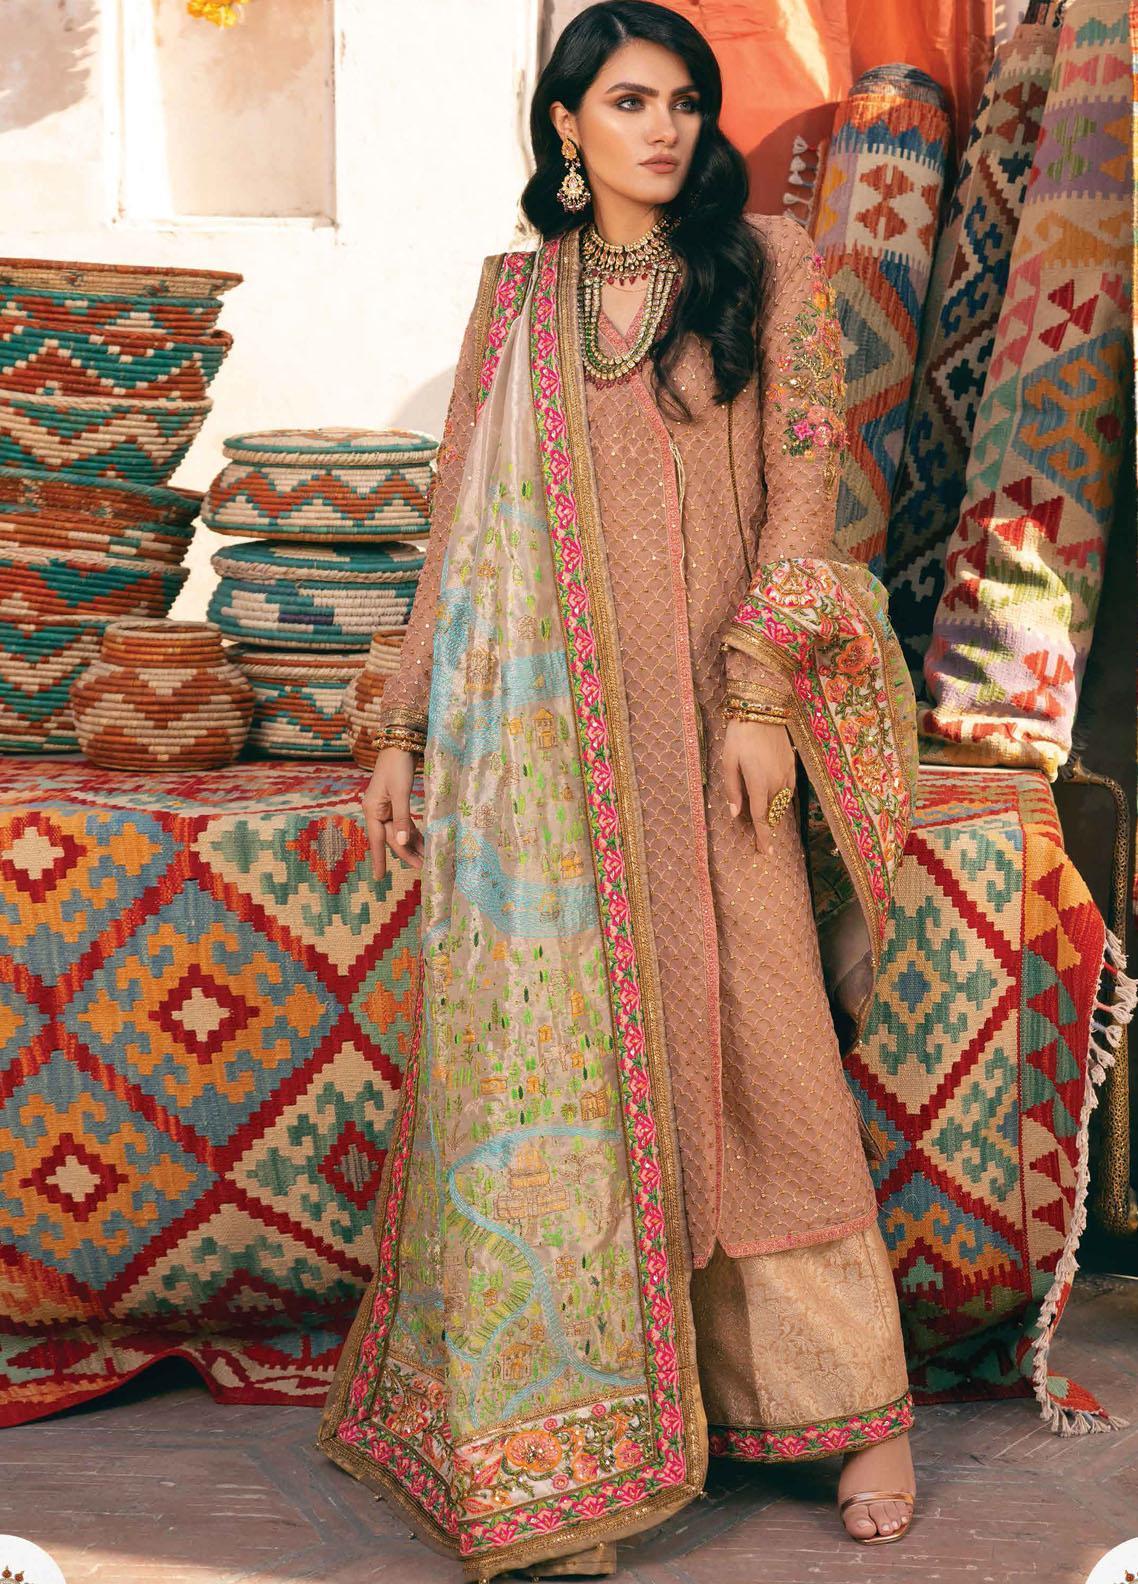 Rang Rasiya RR21HC 01 Heritage Collectables - The Wedding Series Fahad Hussyan